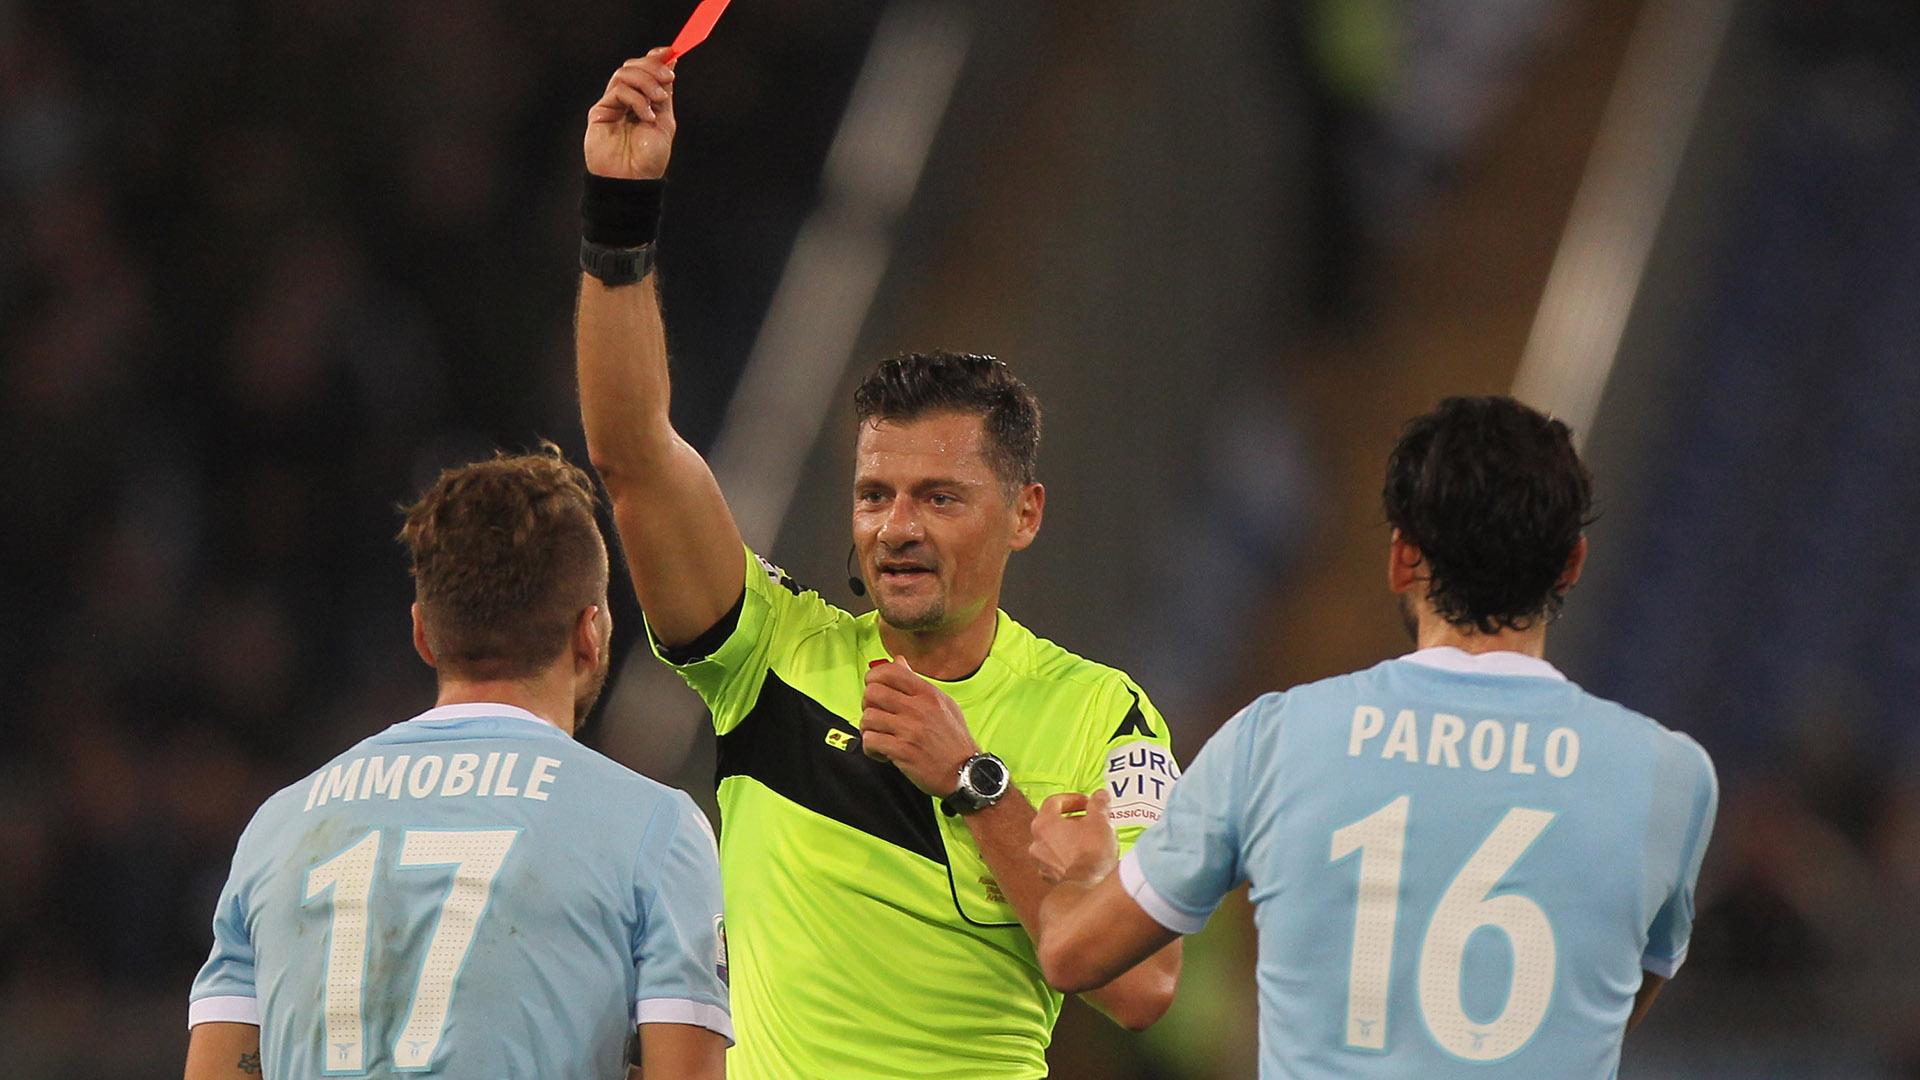 Mihajlovic si gioca la panchina: Torino tra Reja e Mazzarri